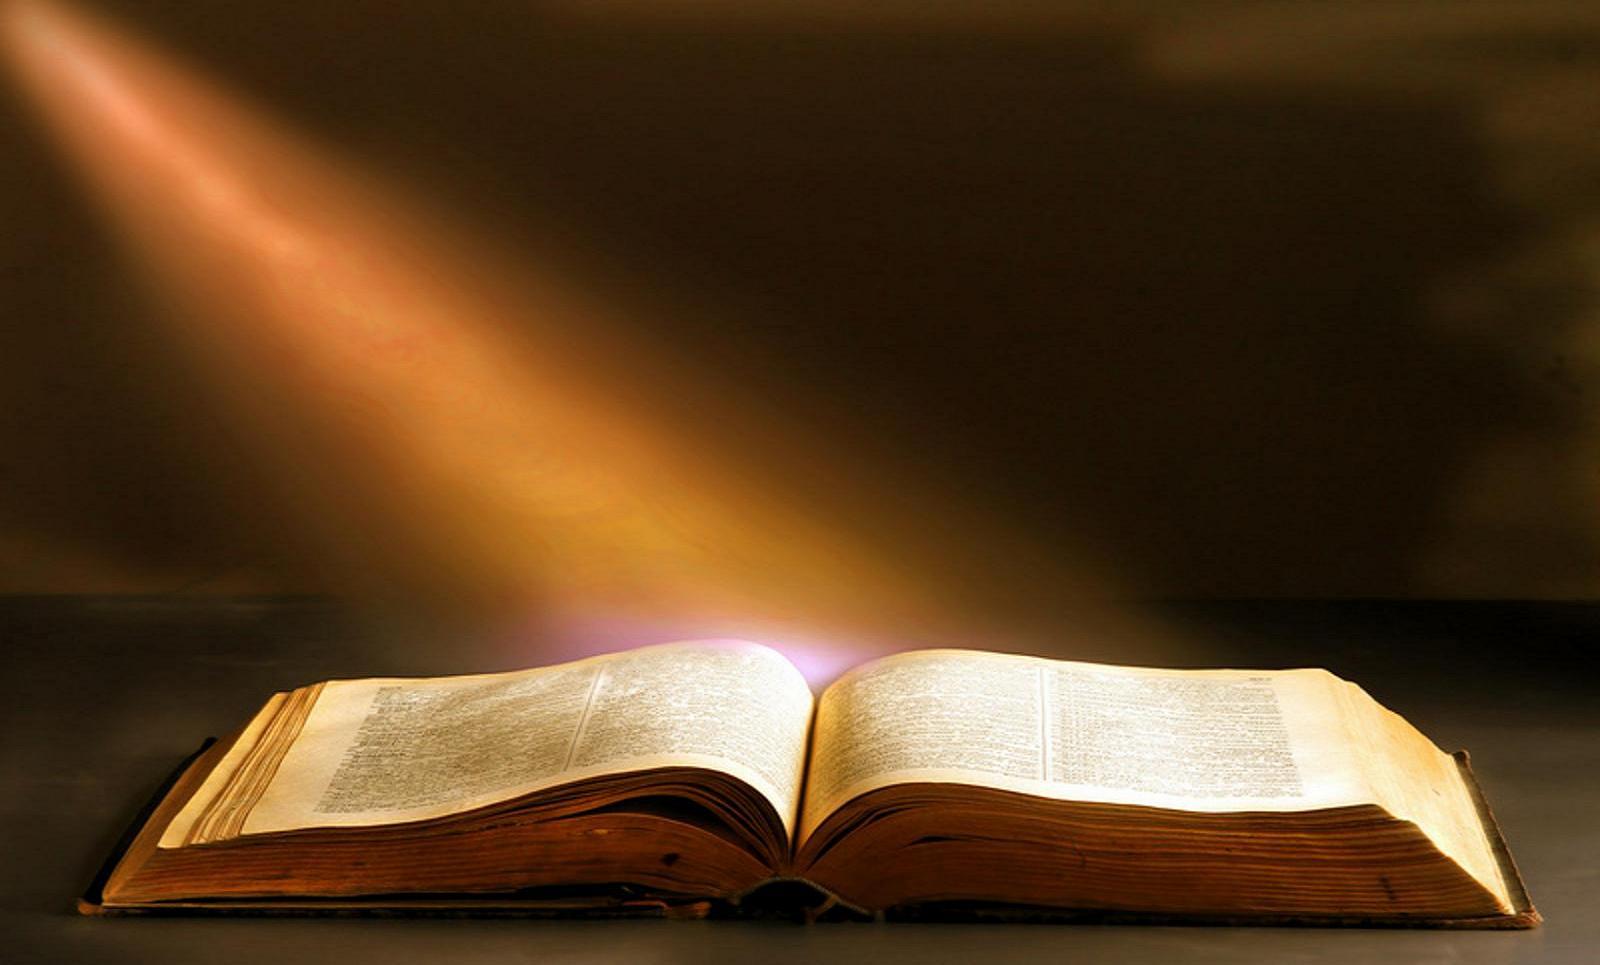 ¿Qué significa que la Biblia es inspirada?